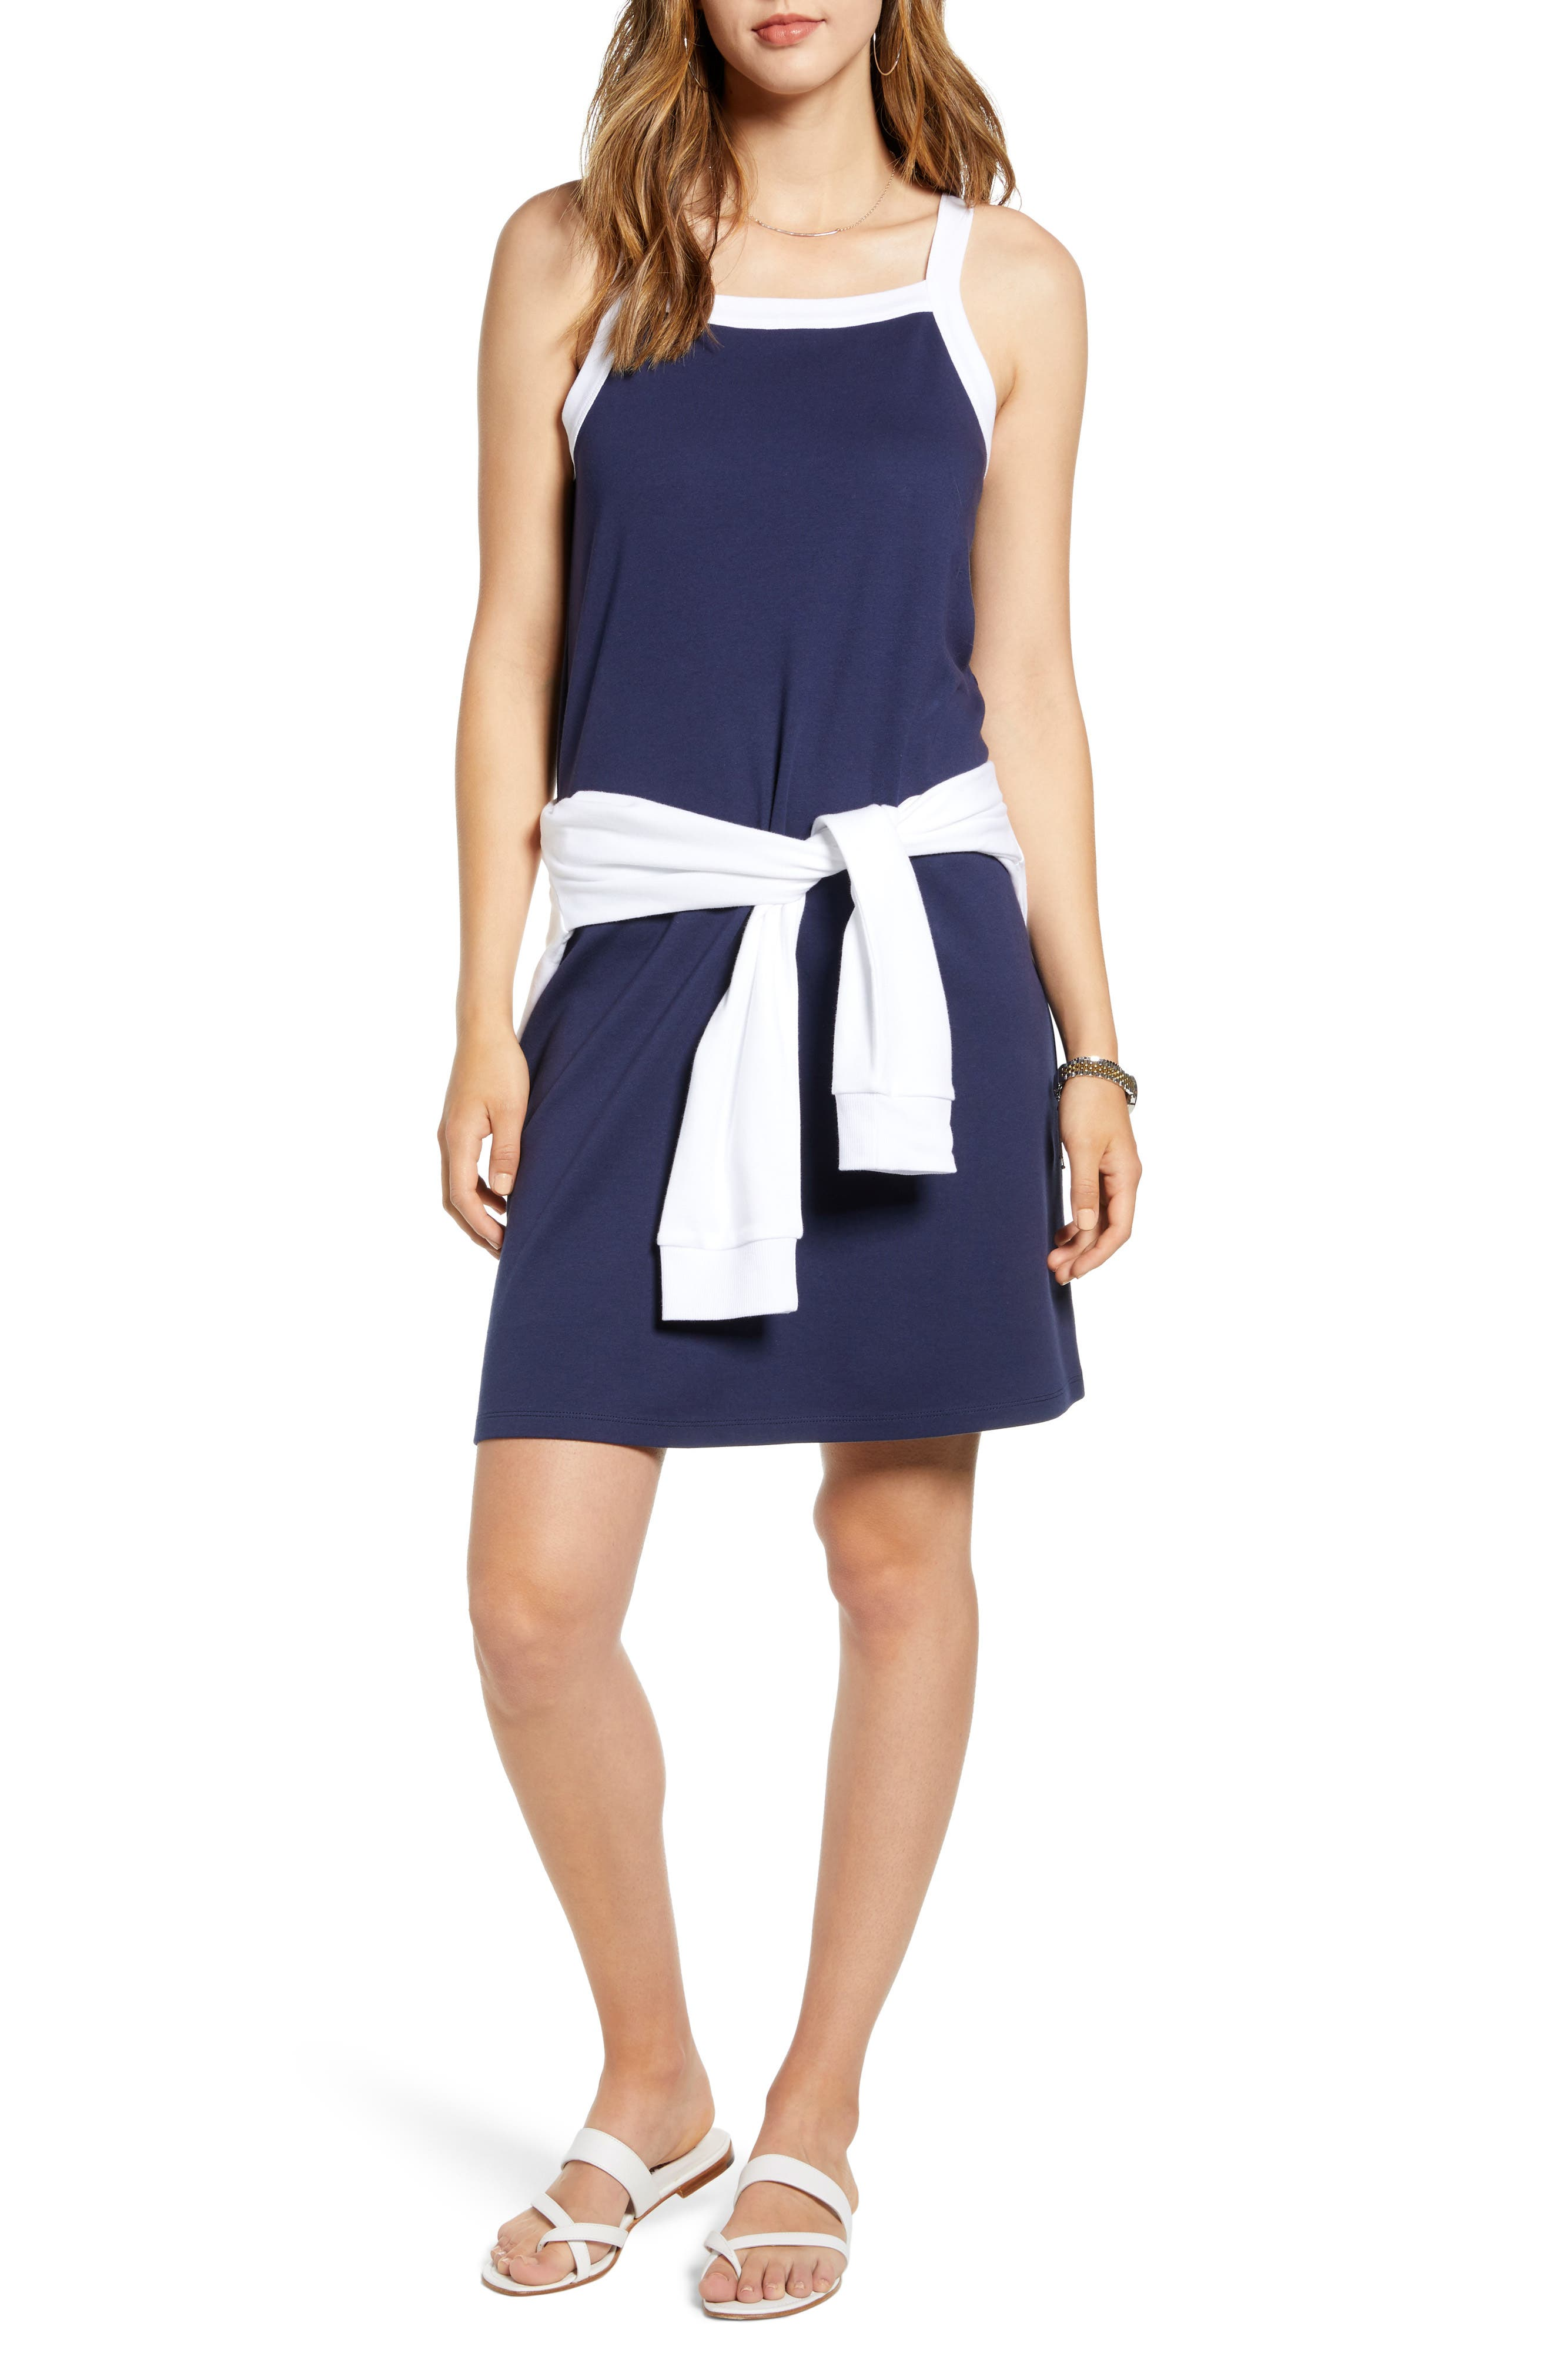 Petite 1901 Sleeveless Knit Tank Dress, Blue